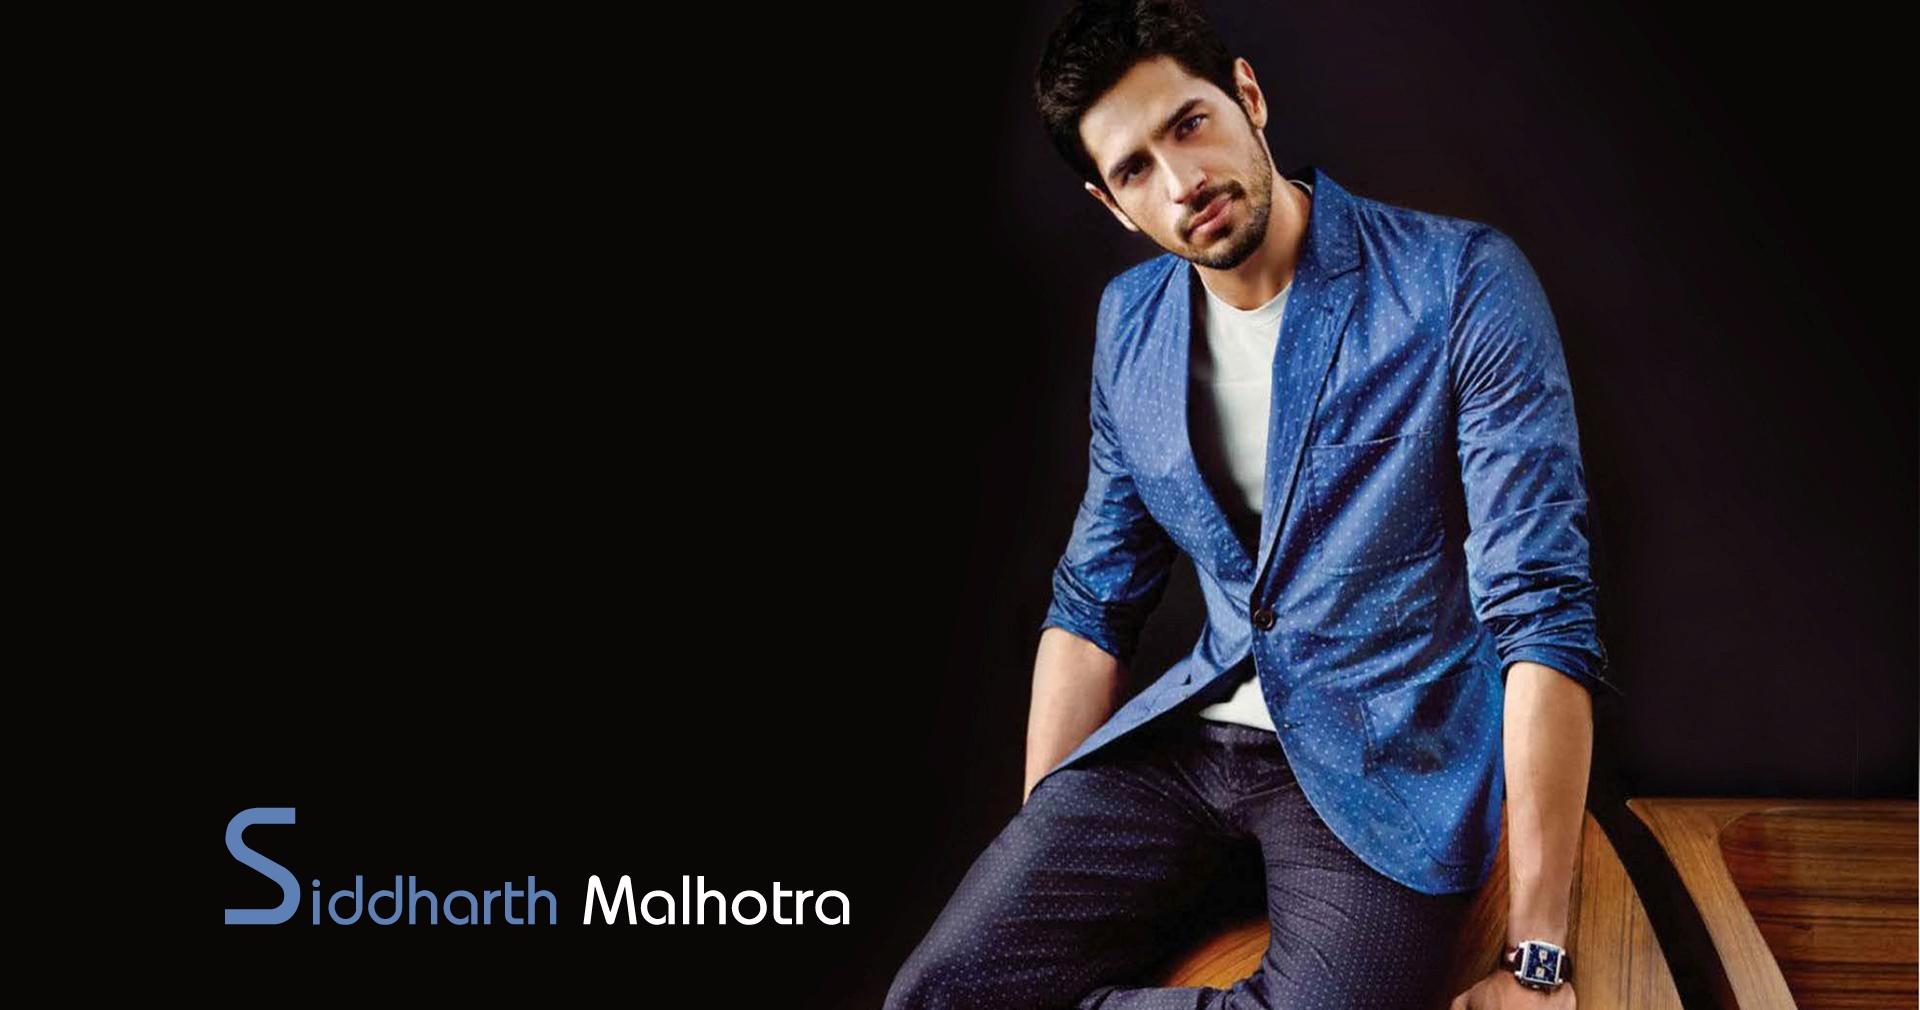 Sidharth Malhotra Images